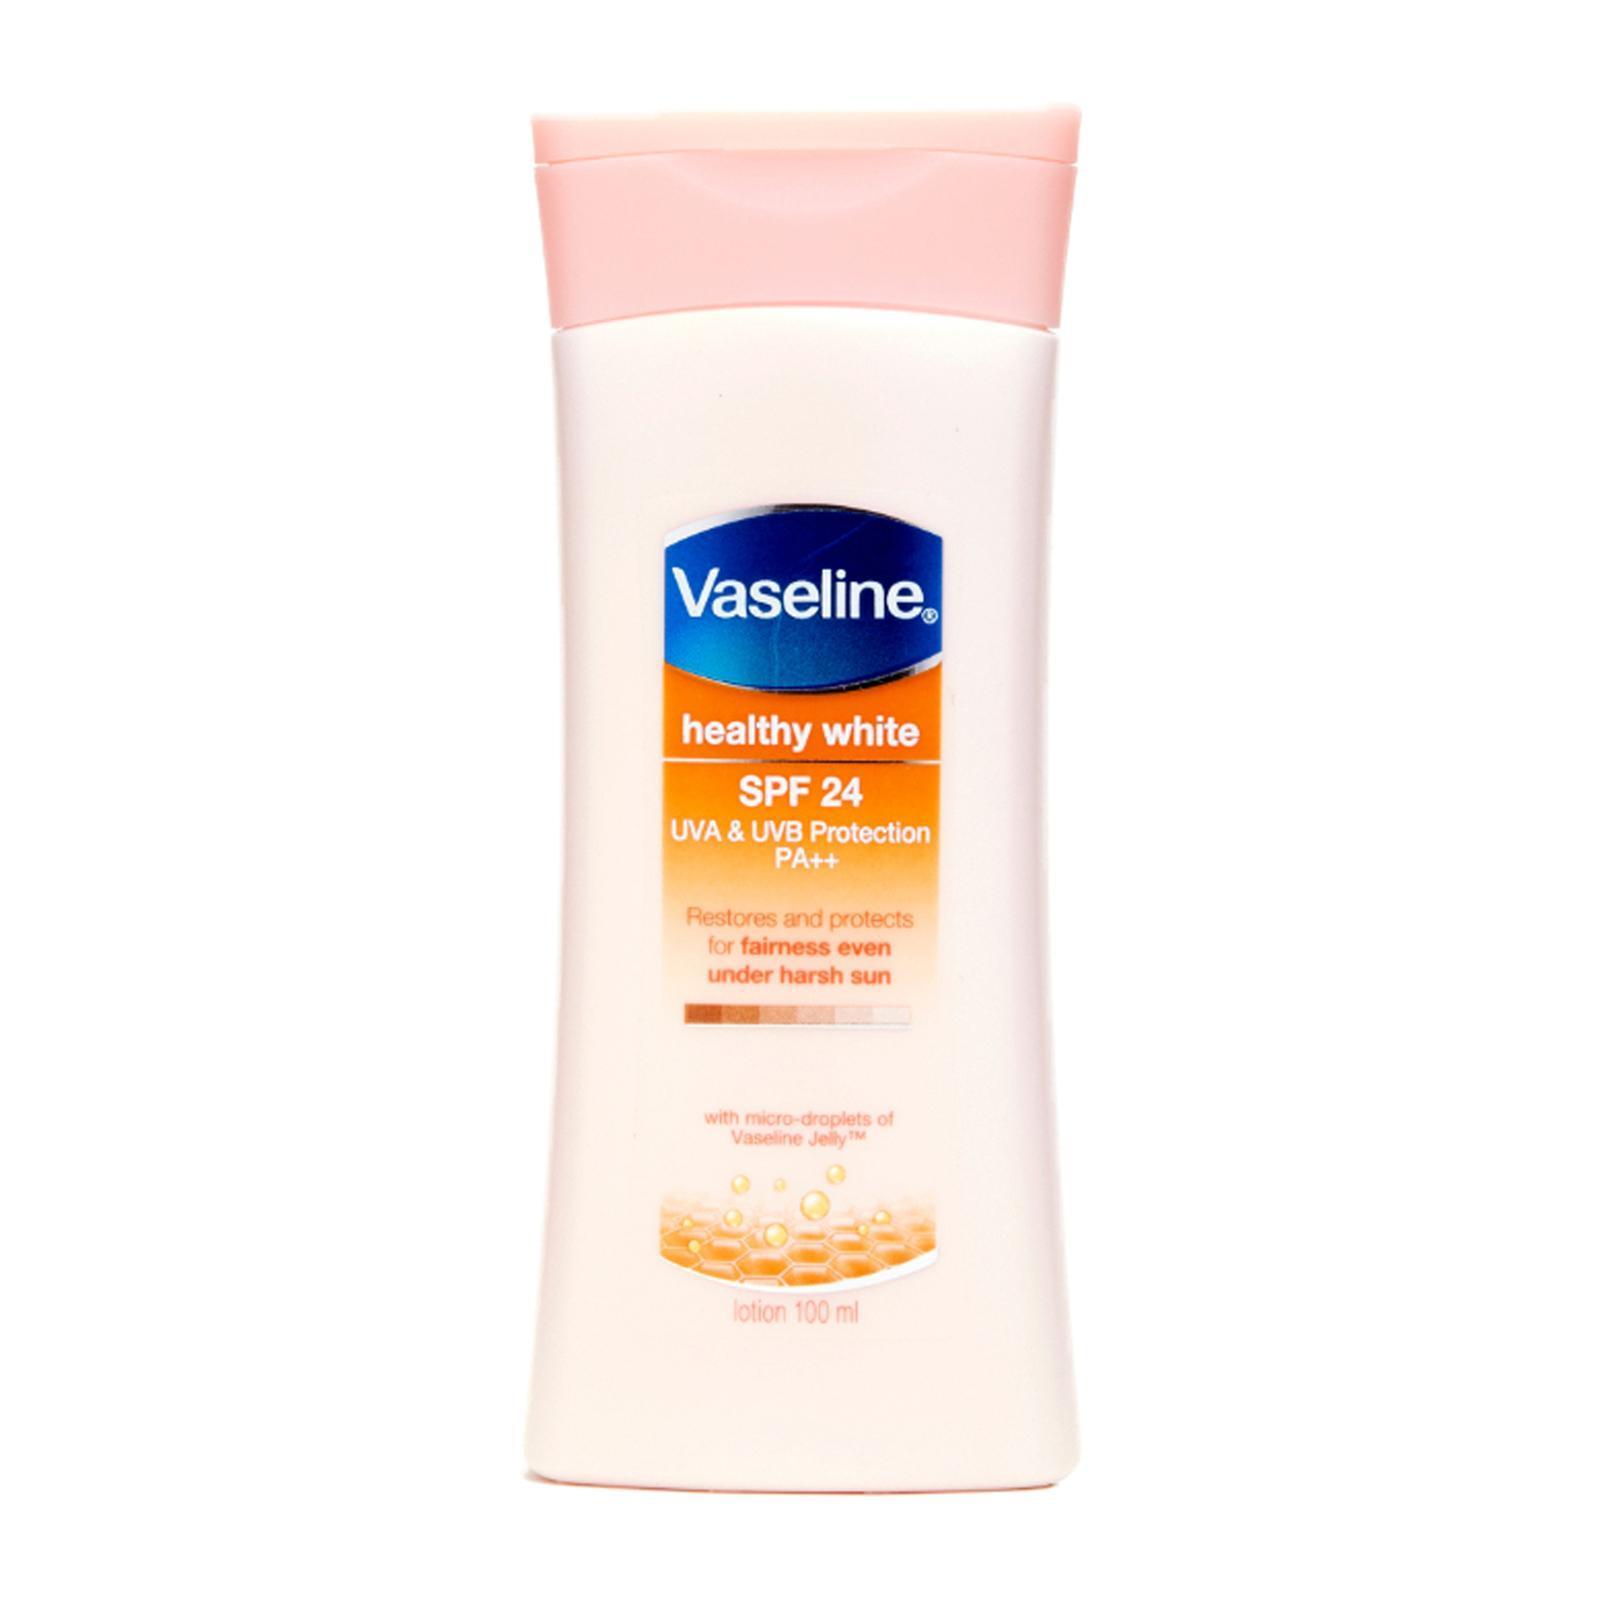 Vaseline Healthy White Triple Lotion SPF 24, 100 ml